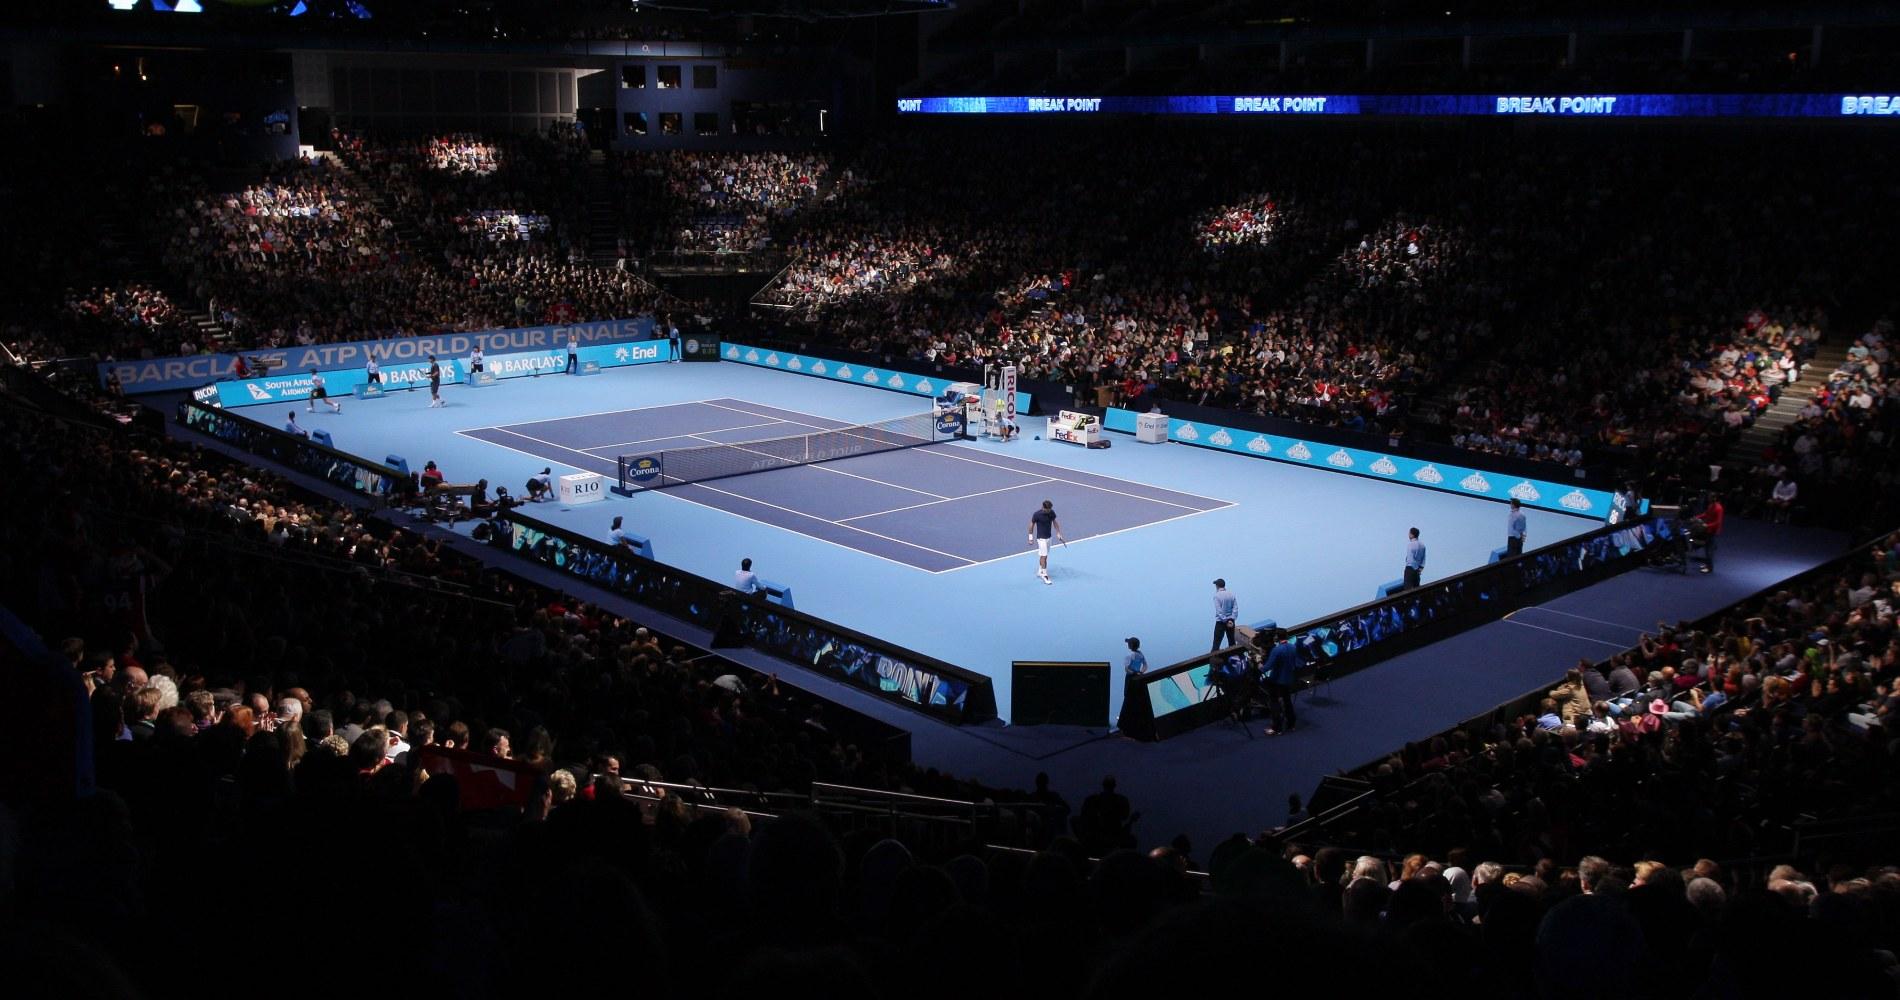 Nitto ATP FINALS 2011